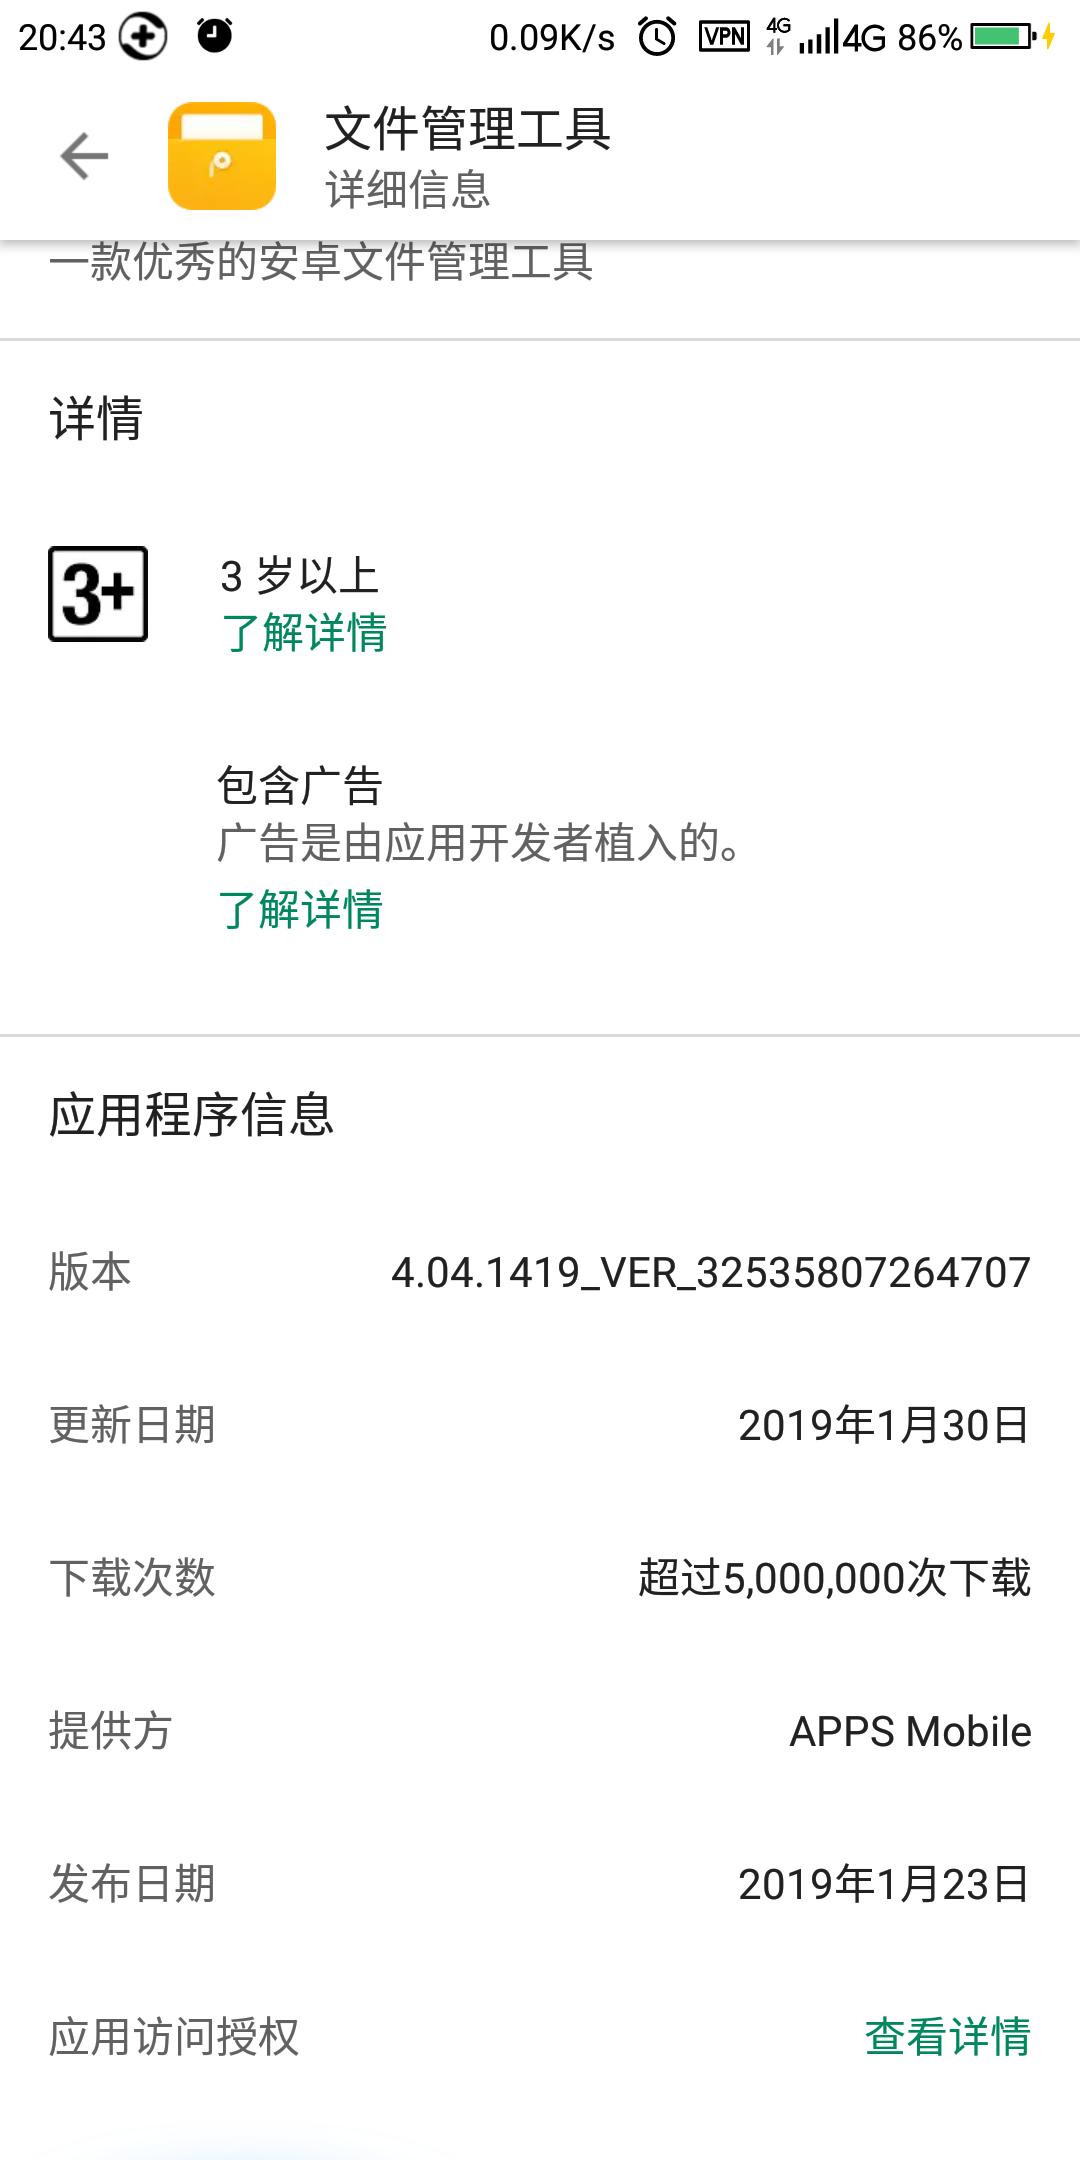 Screenshot_2019-03-18-20-43-39.png